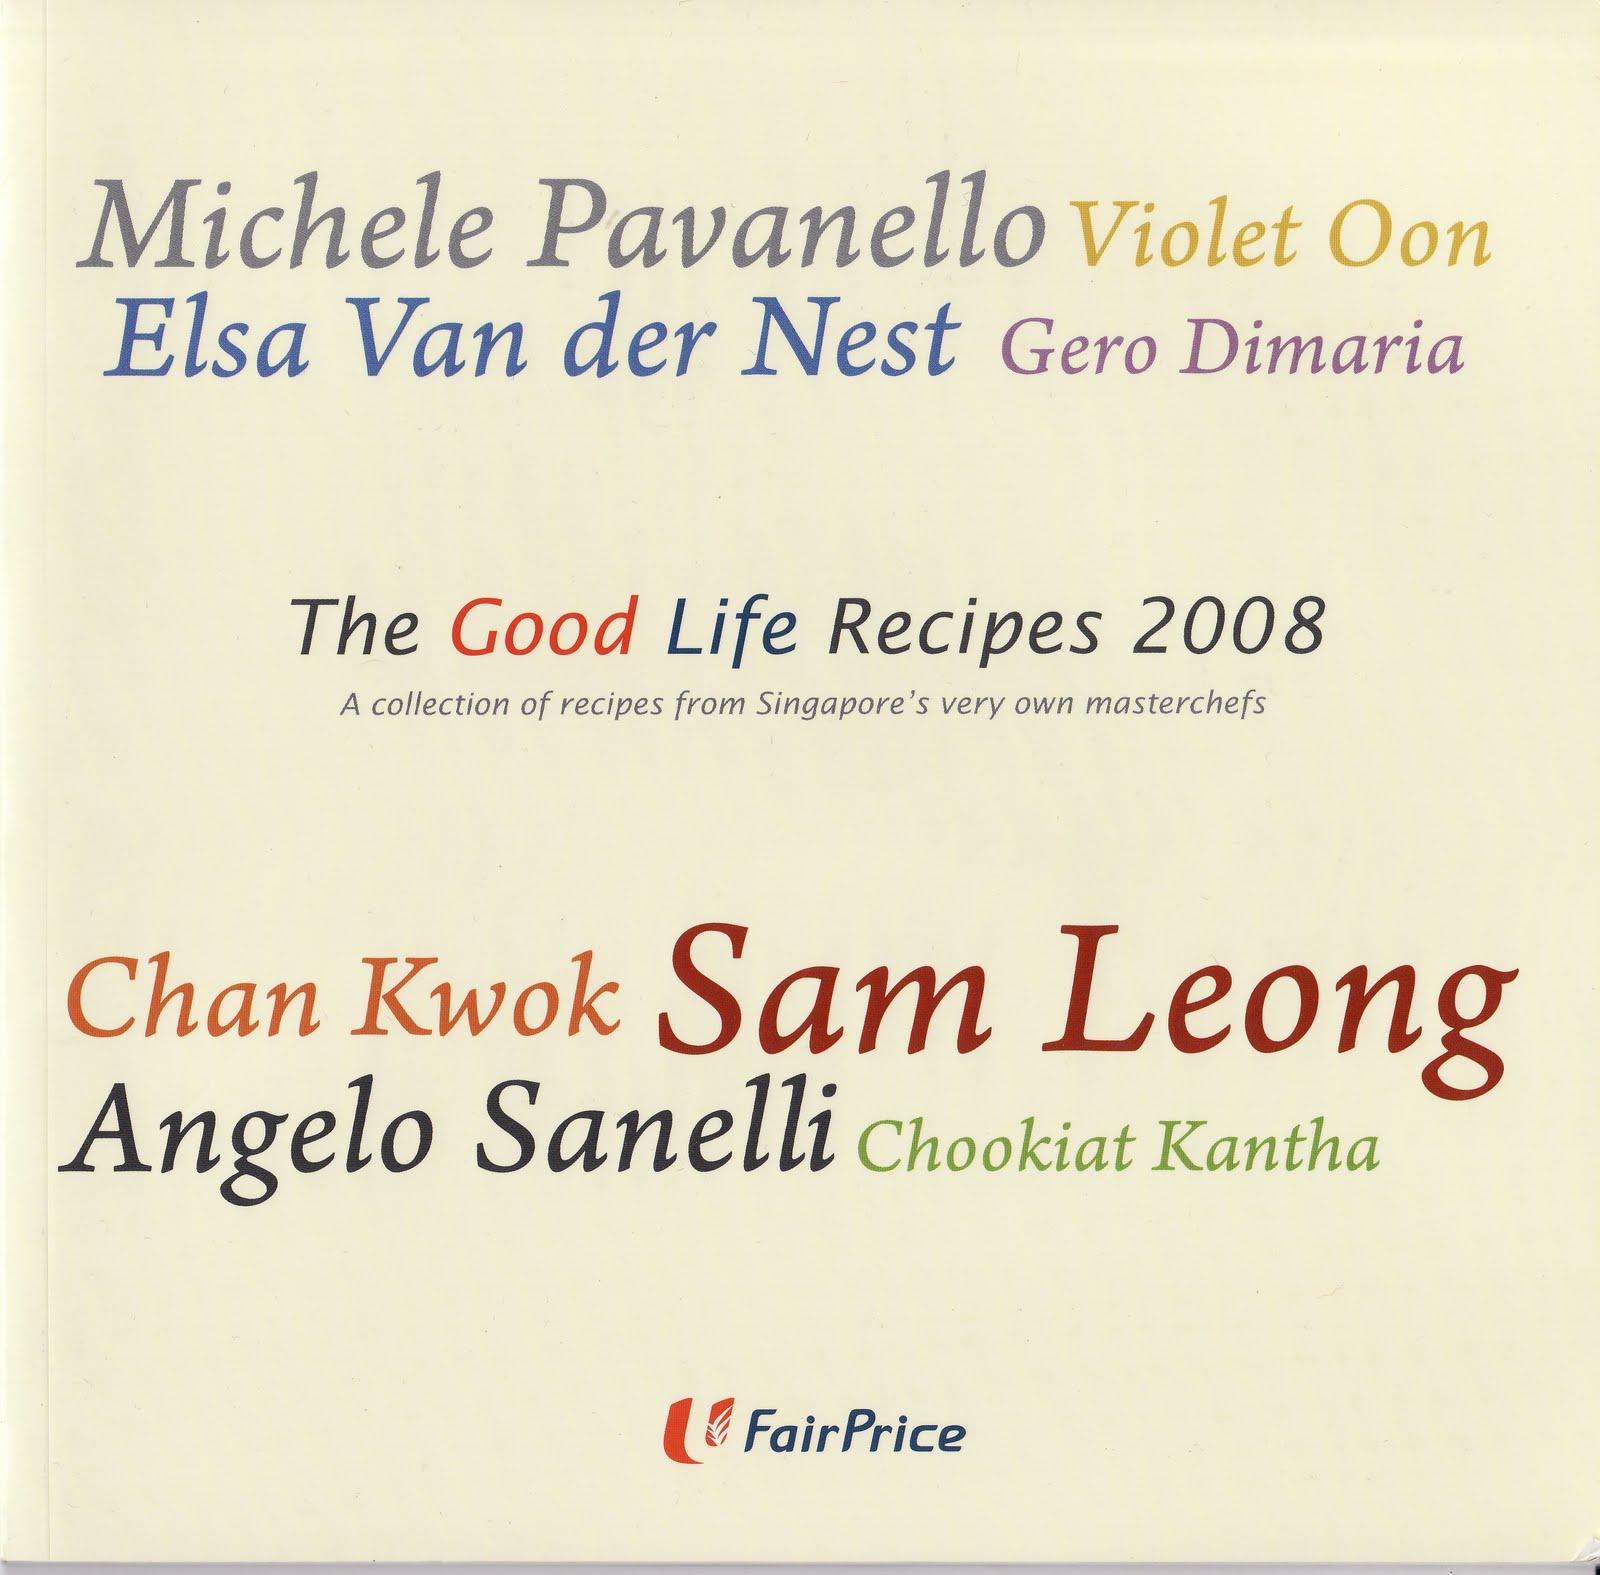 Good Life Recipes 2008, Wok Ideas Adam Hee, Simple Cooking Mdm Lee Swee Har